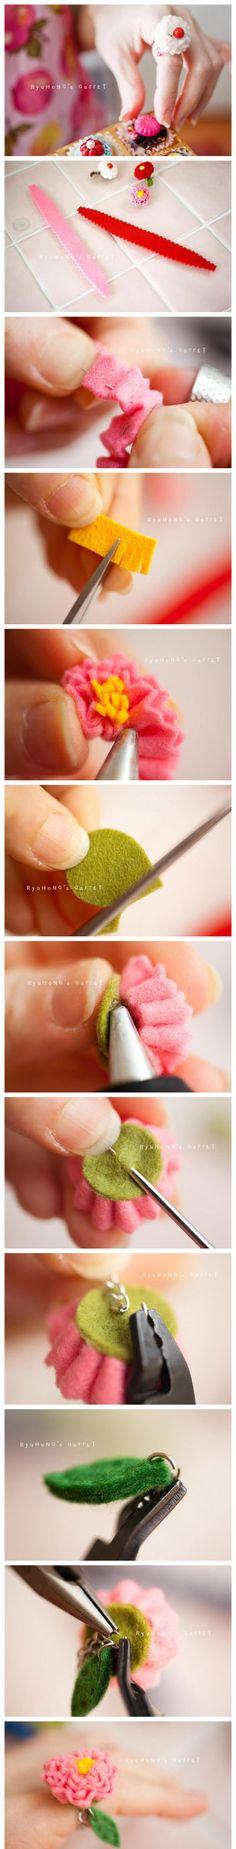 DIY a floral ring